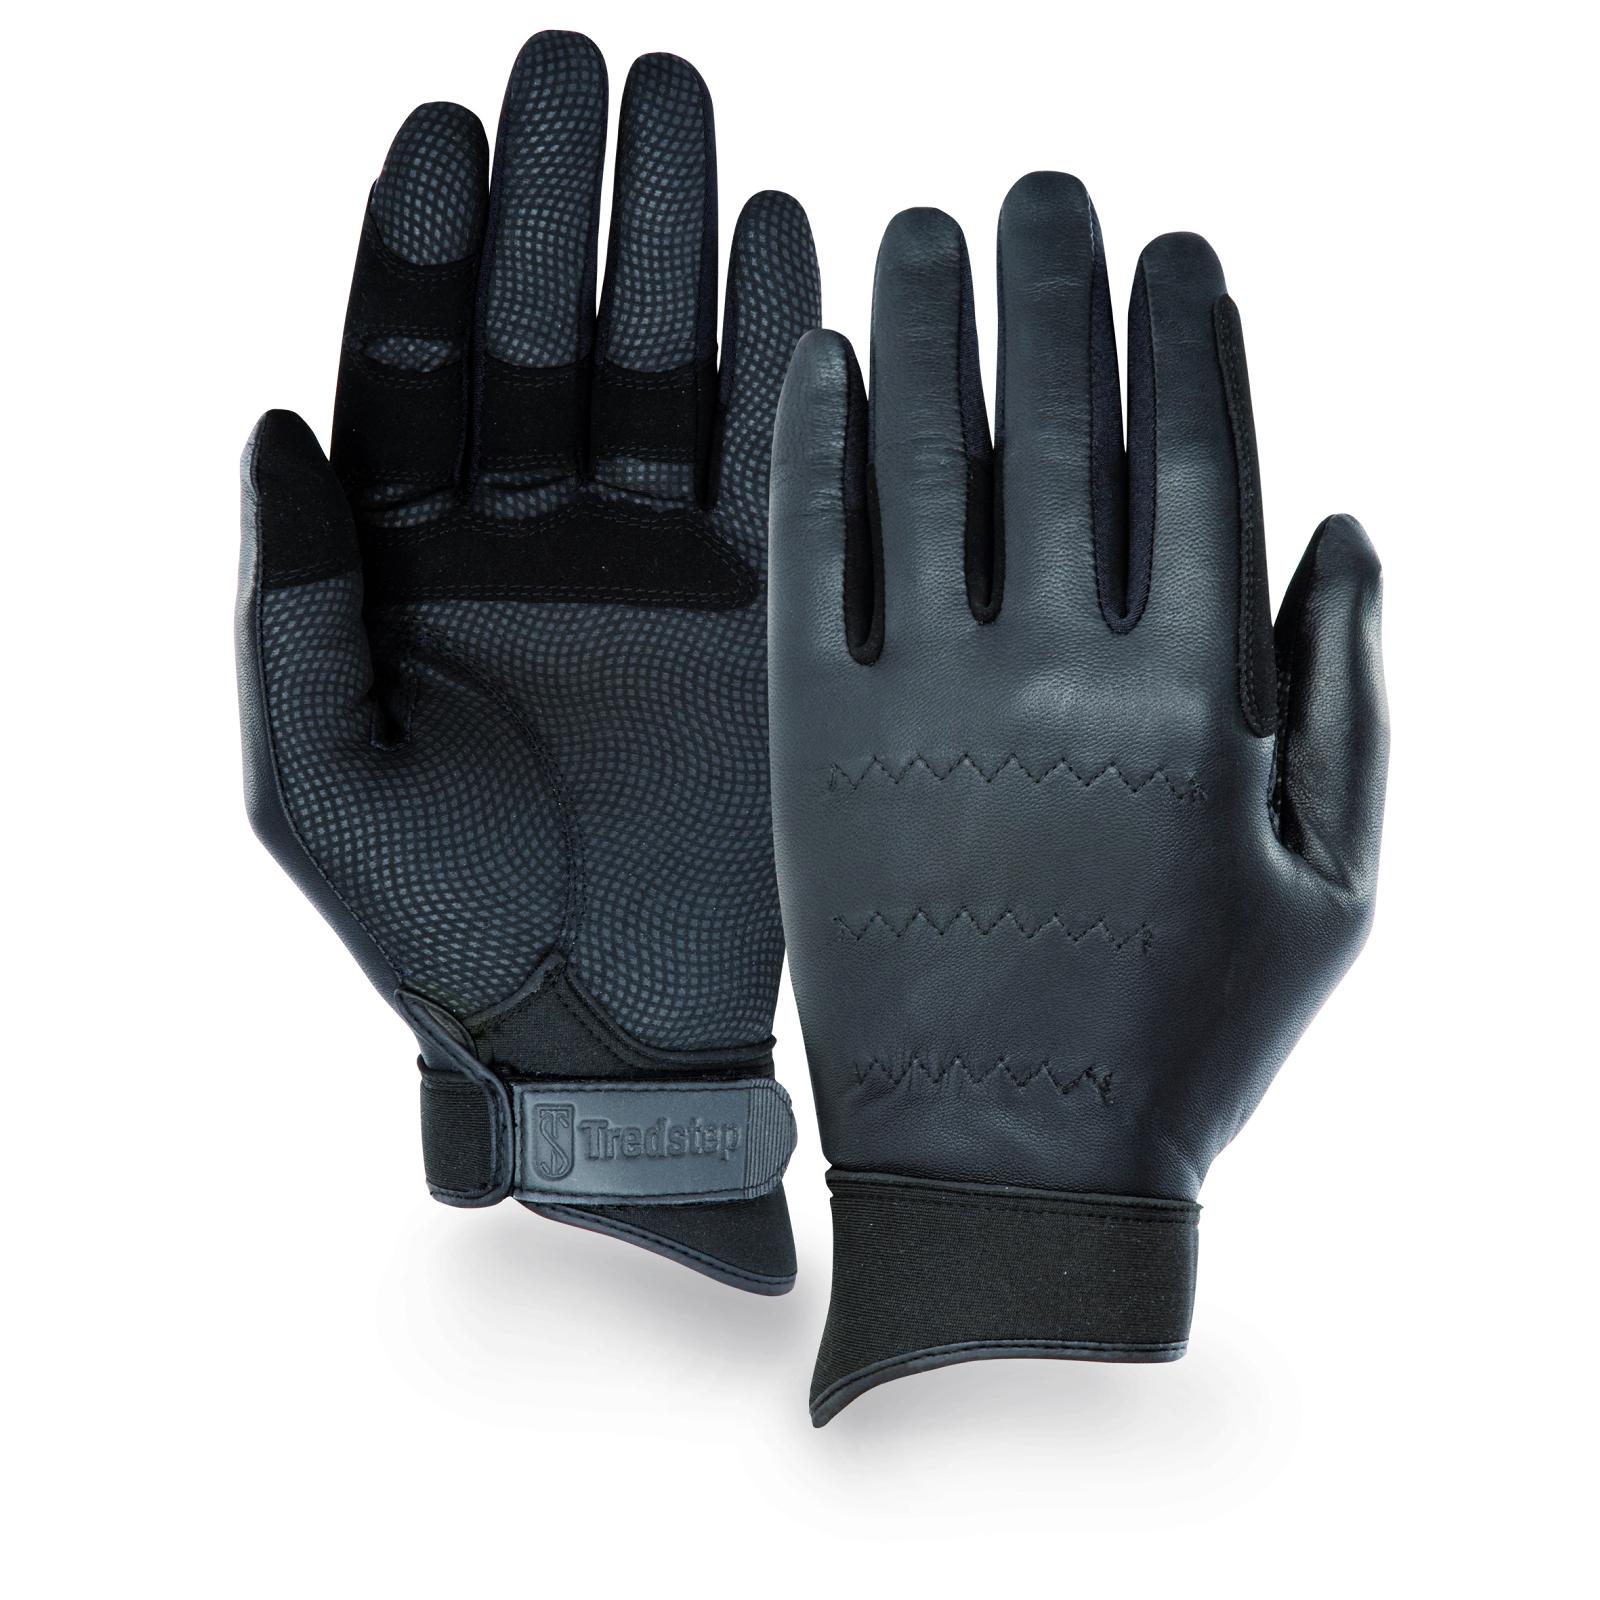 Tredstep Ireland Show Hunter Gloves